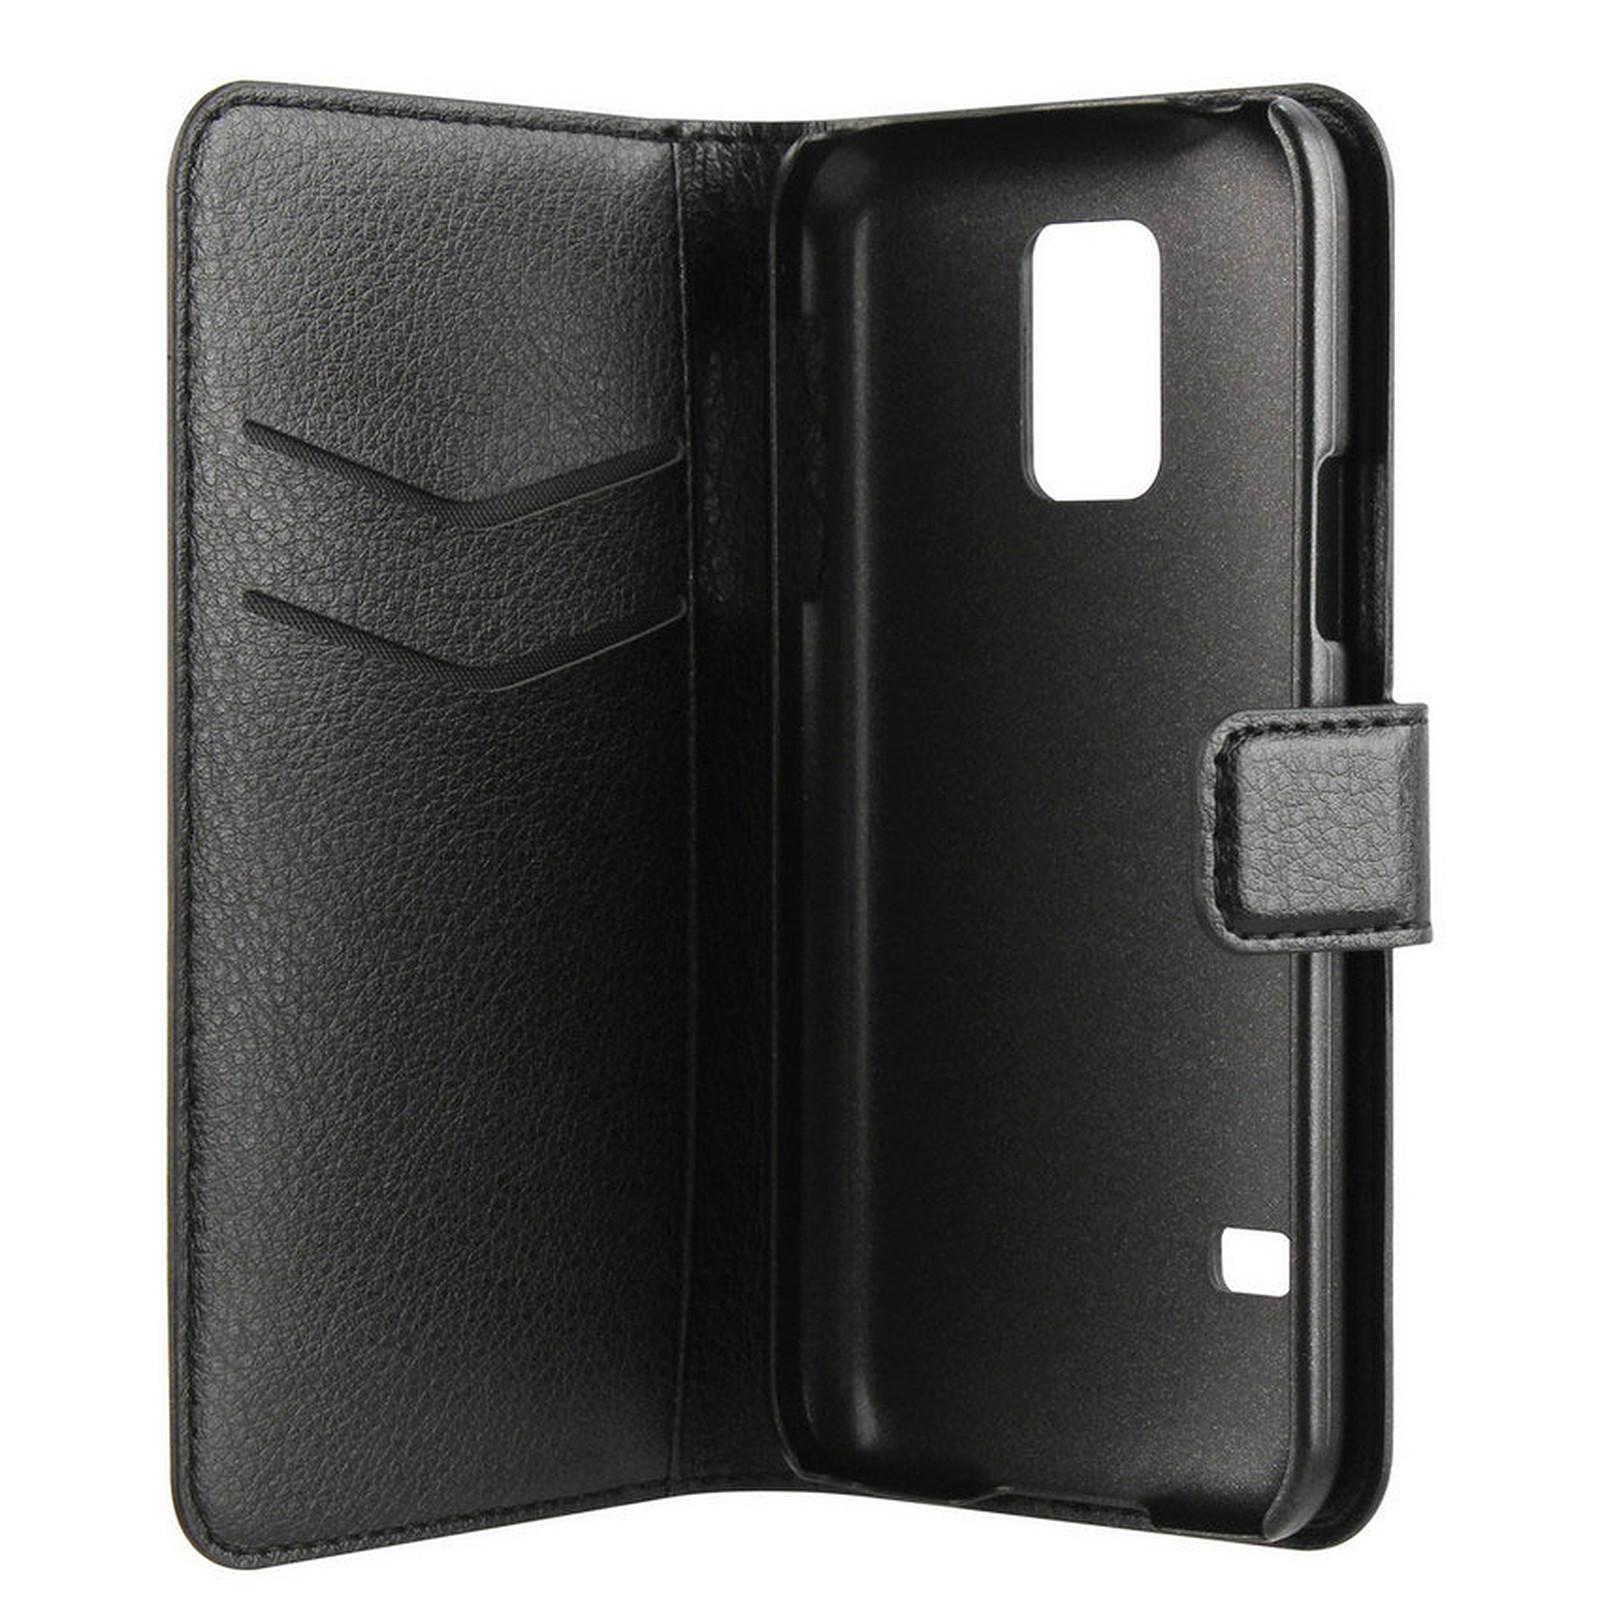 xqisit Etui Wallet Galaxy S5 Mini Noir